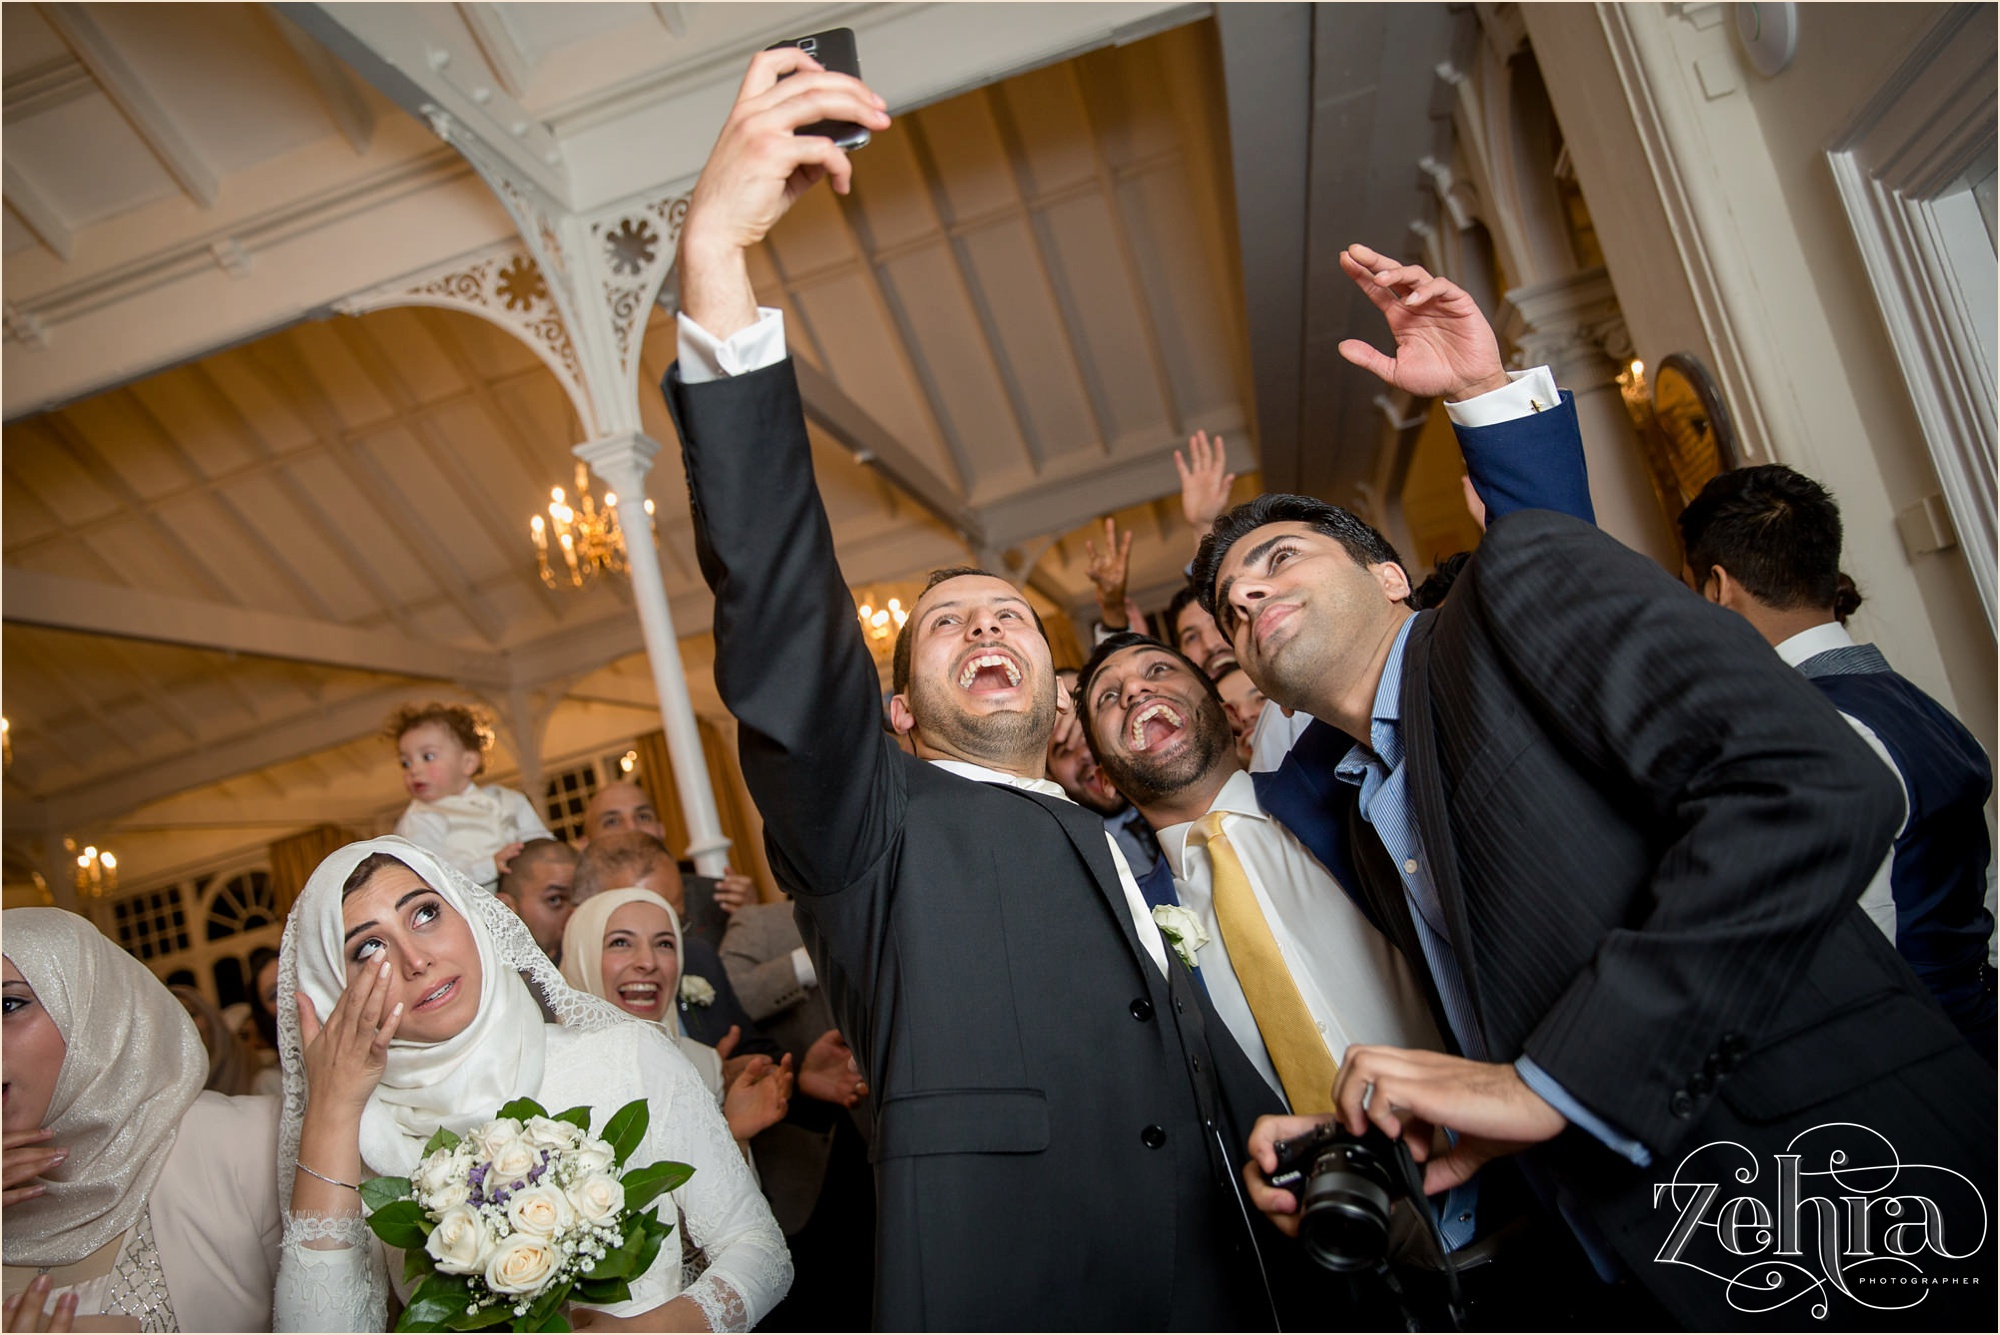 jasira manchester wedding photographer_0128.jpg